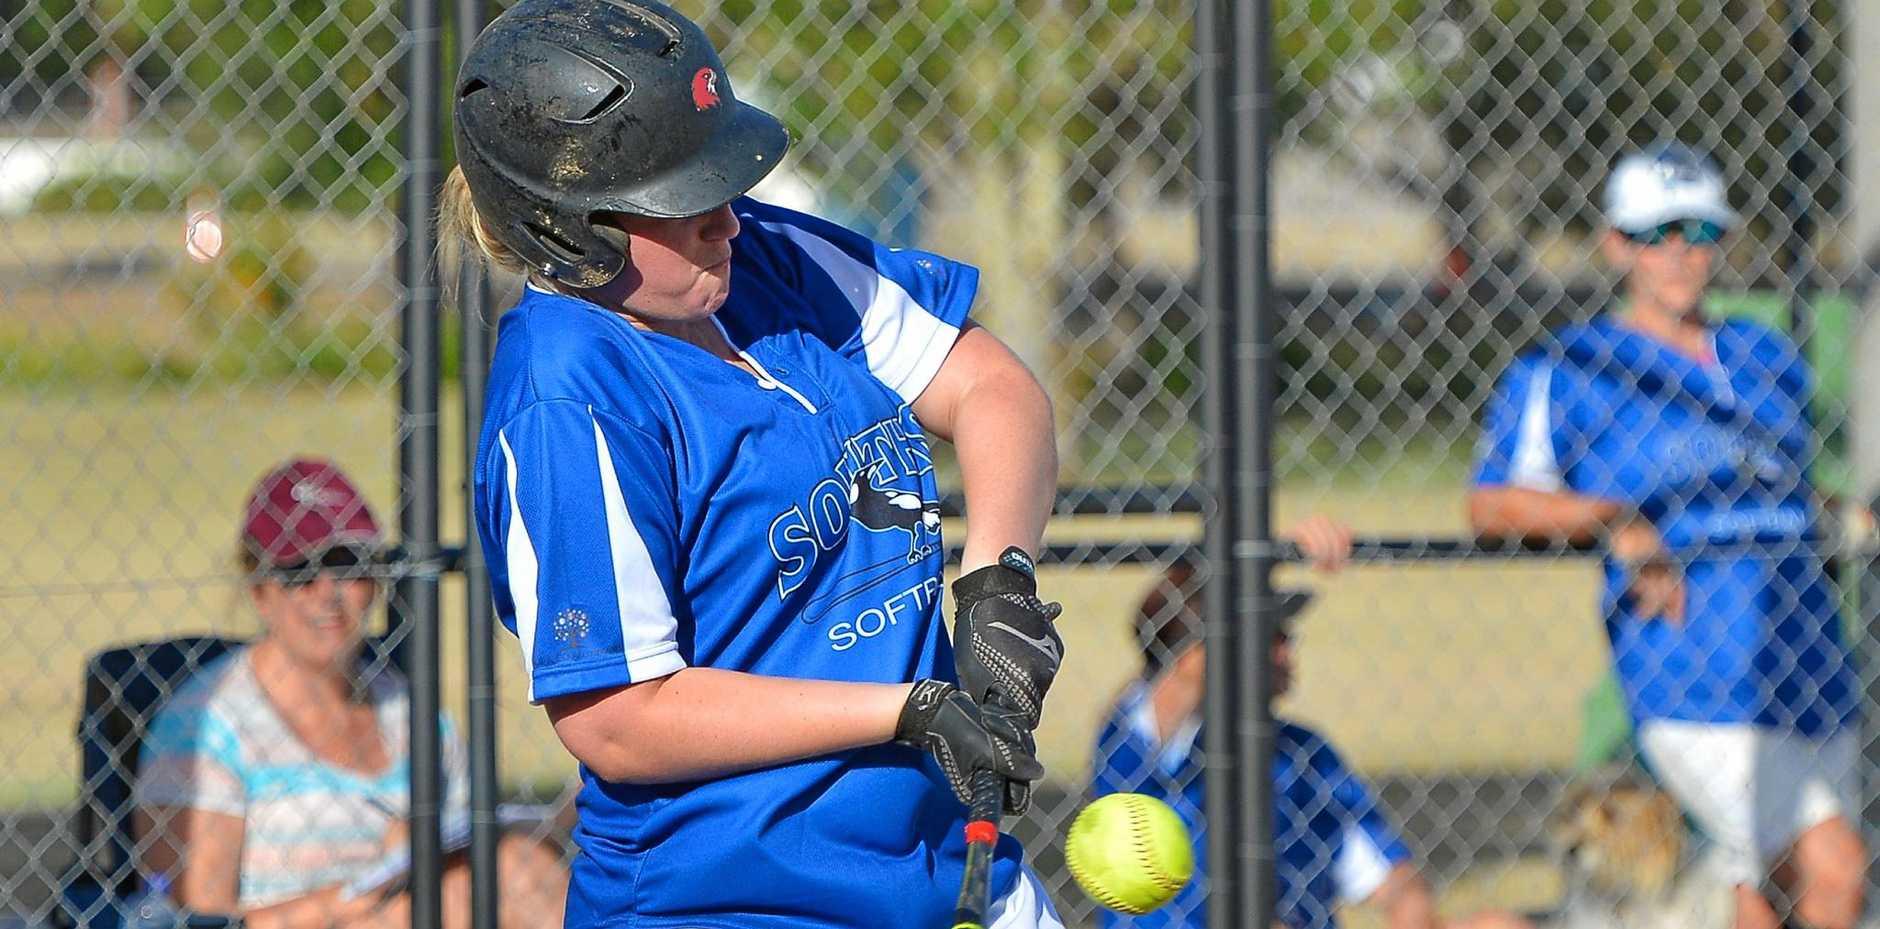 Souths Teanne Noonan keeps her eye on the ball while batting against Rockhampton.